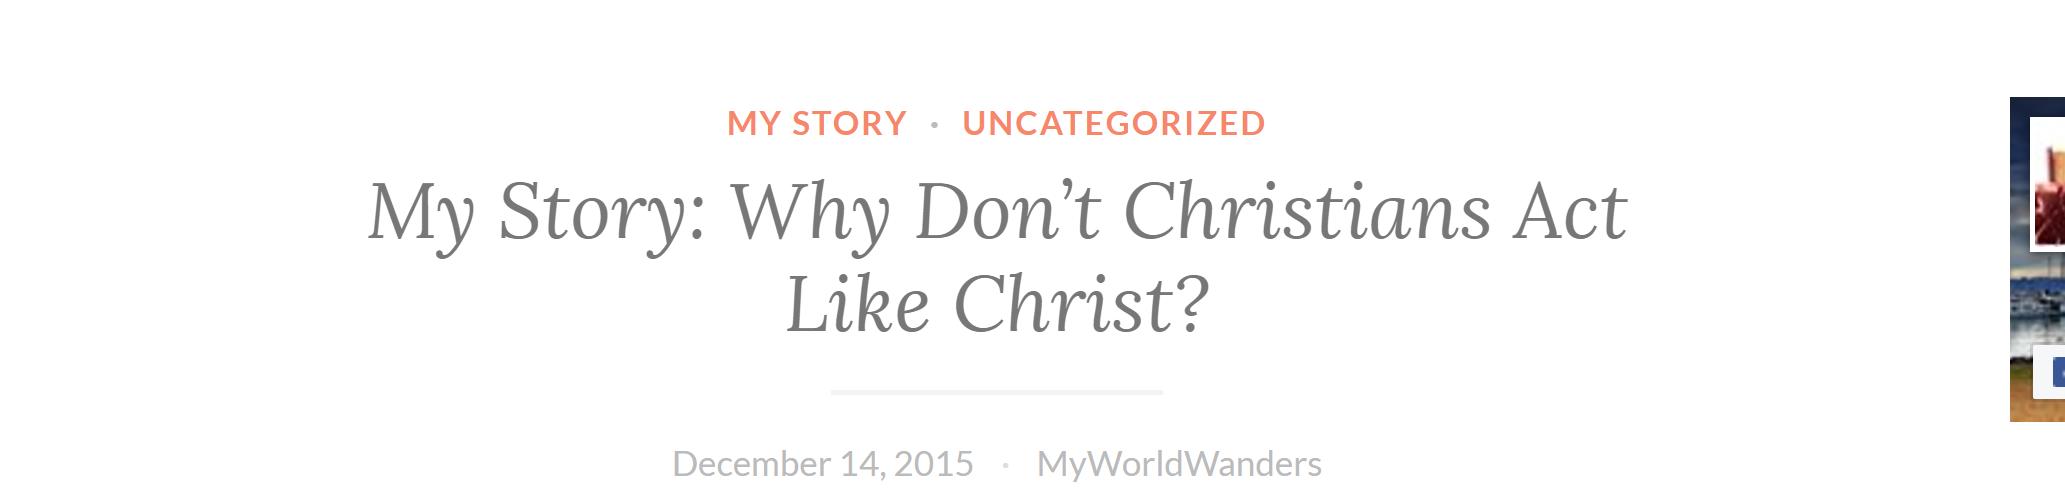 christlike headline5.png